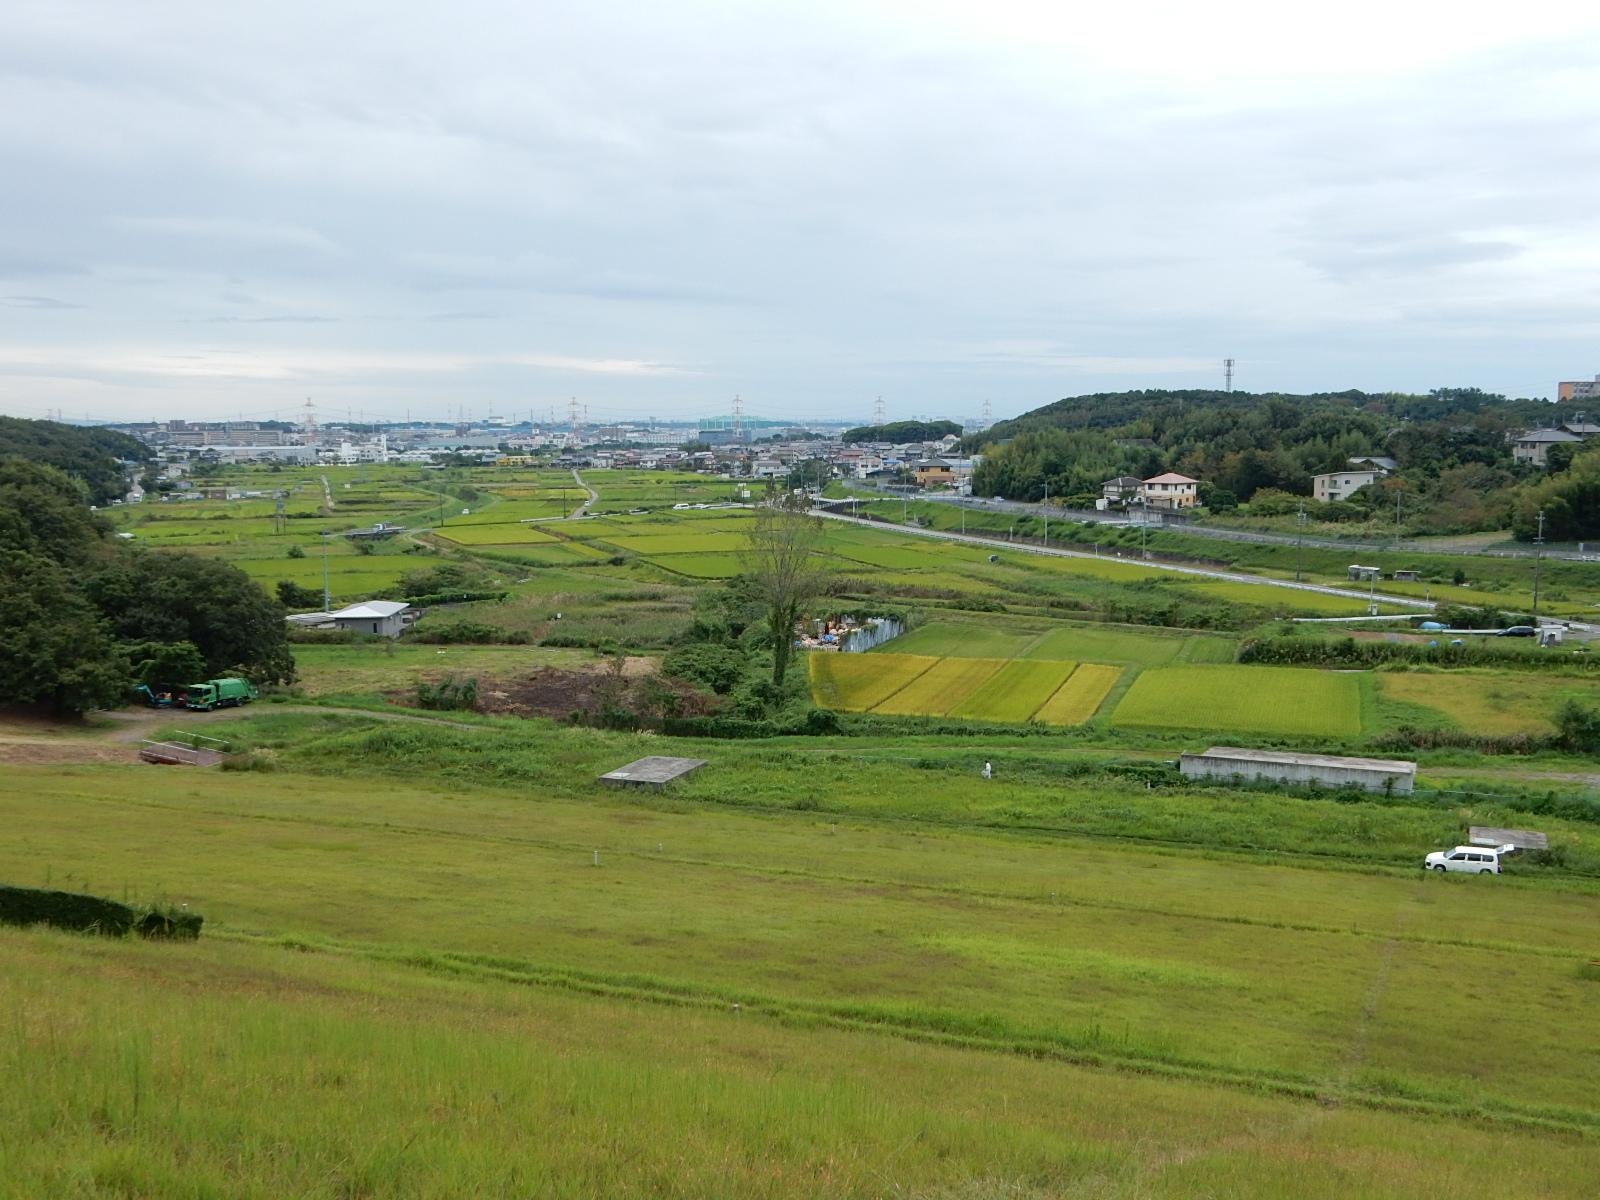 <p>2021年9月撮影<br /> 東郷調整池(愛知池)から見た田園風景</p>